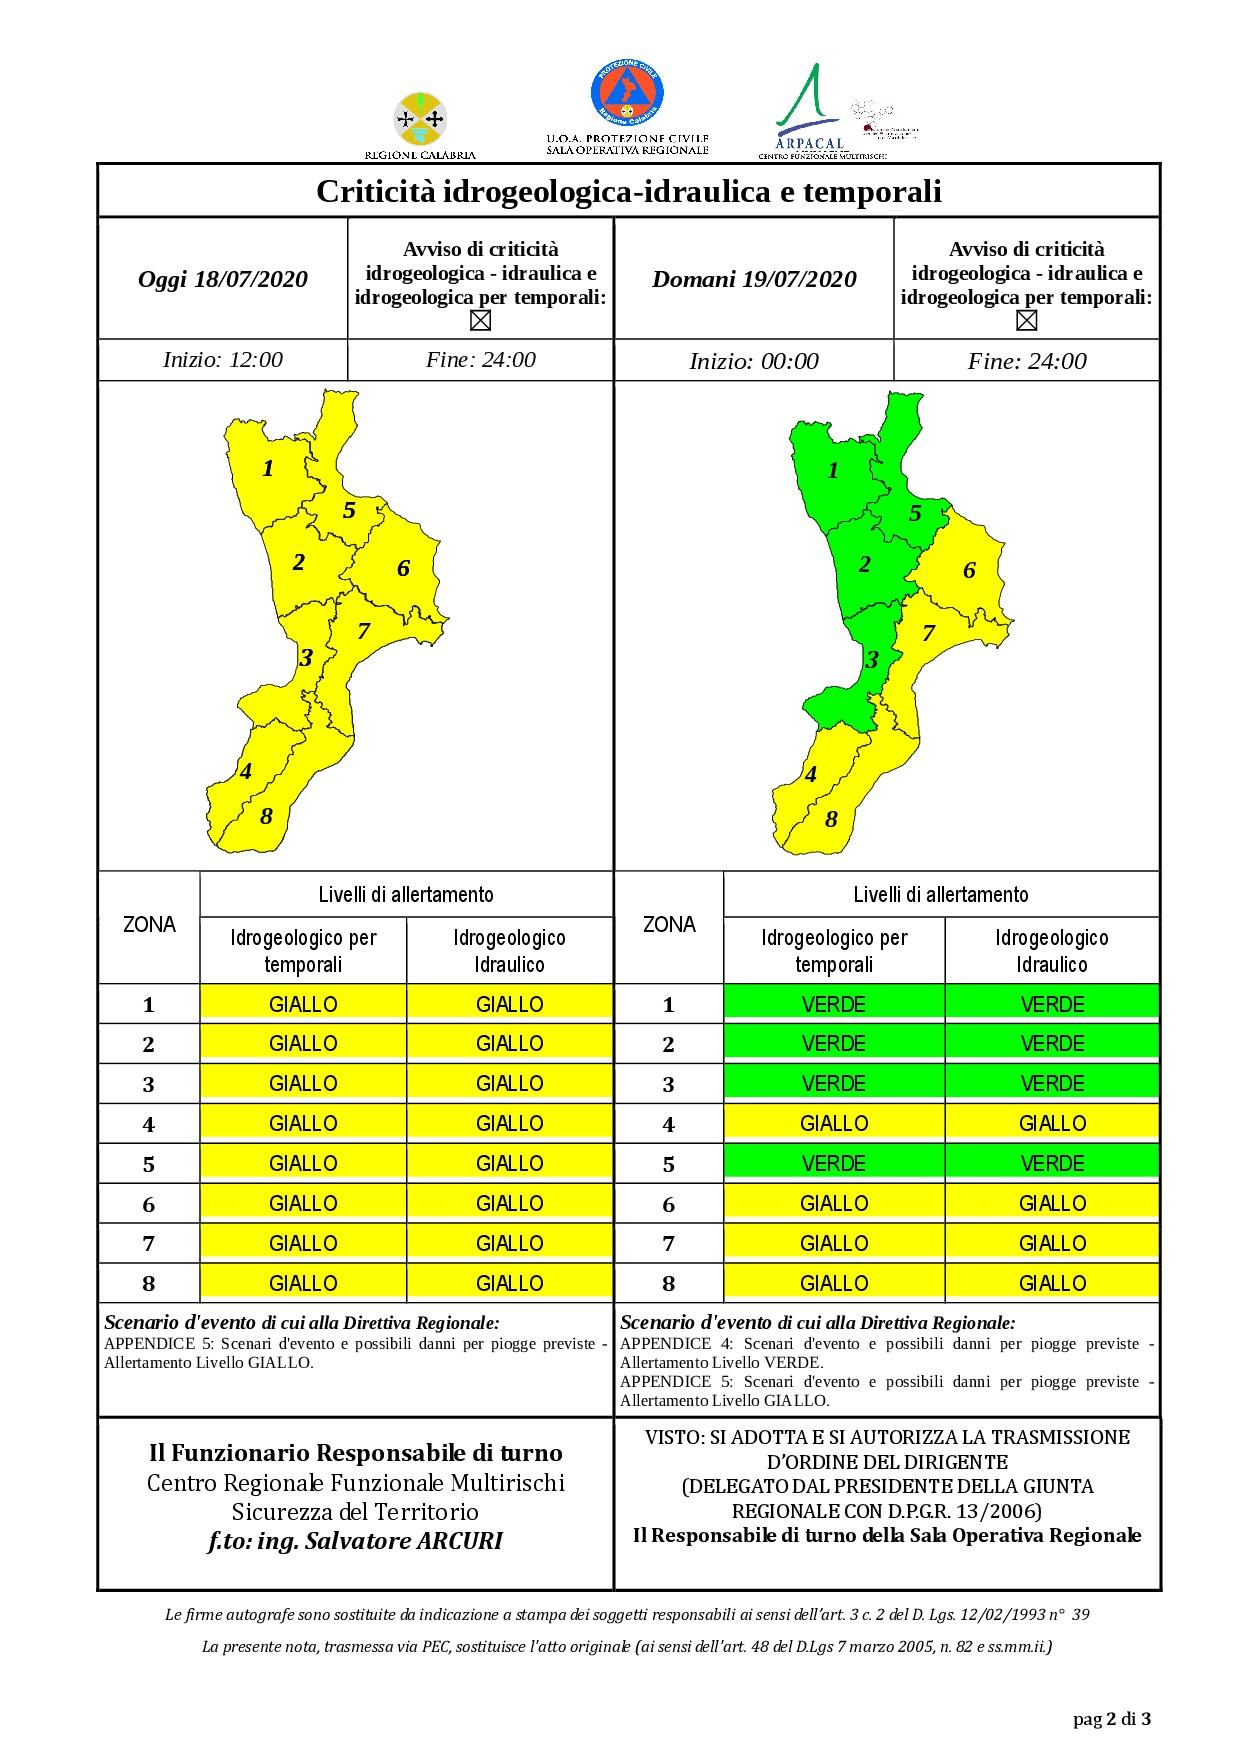 Criticità idrogeologica-idraulica e temporali in Calabria 18-07-2020